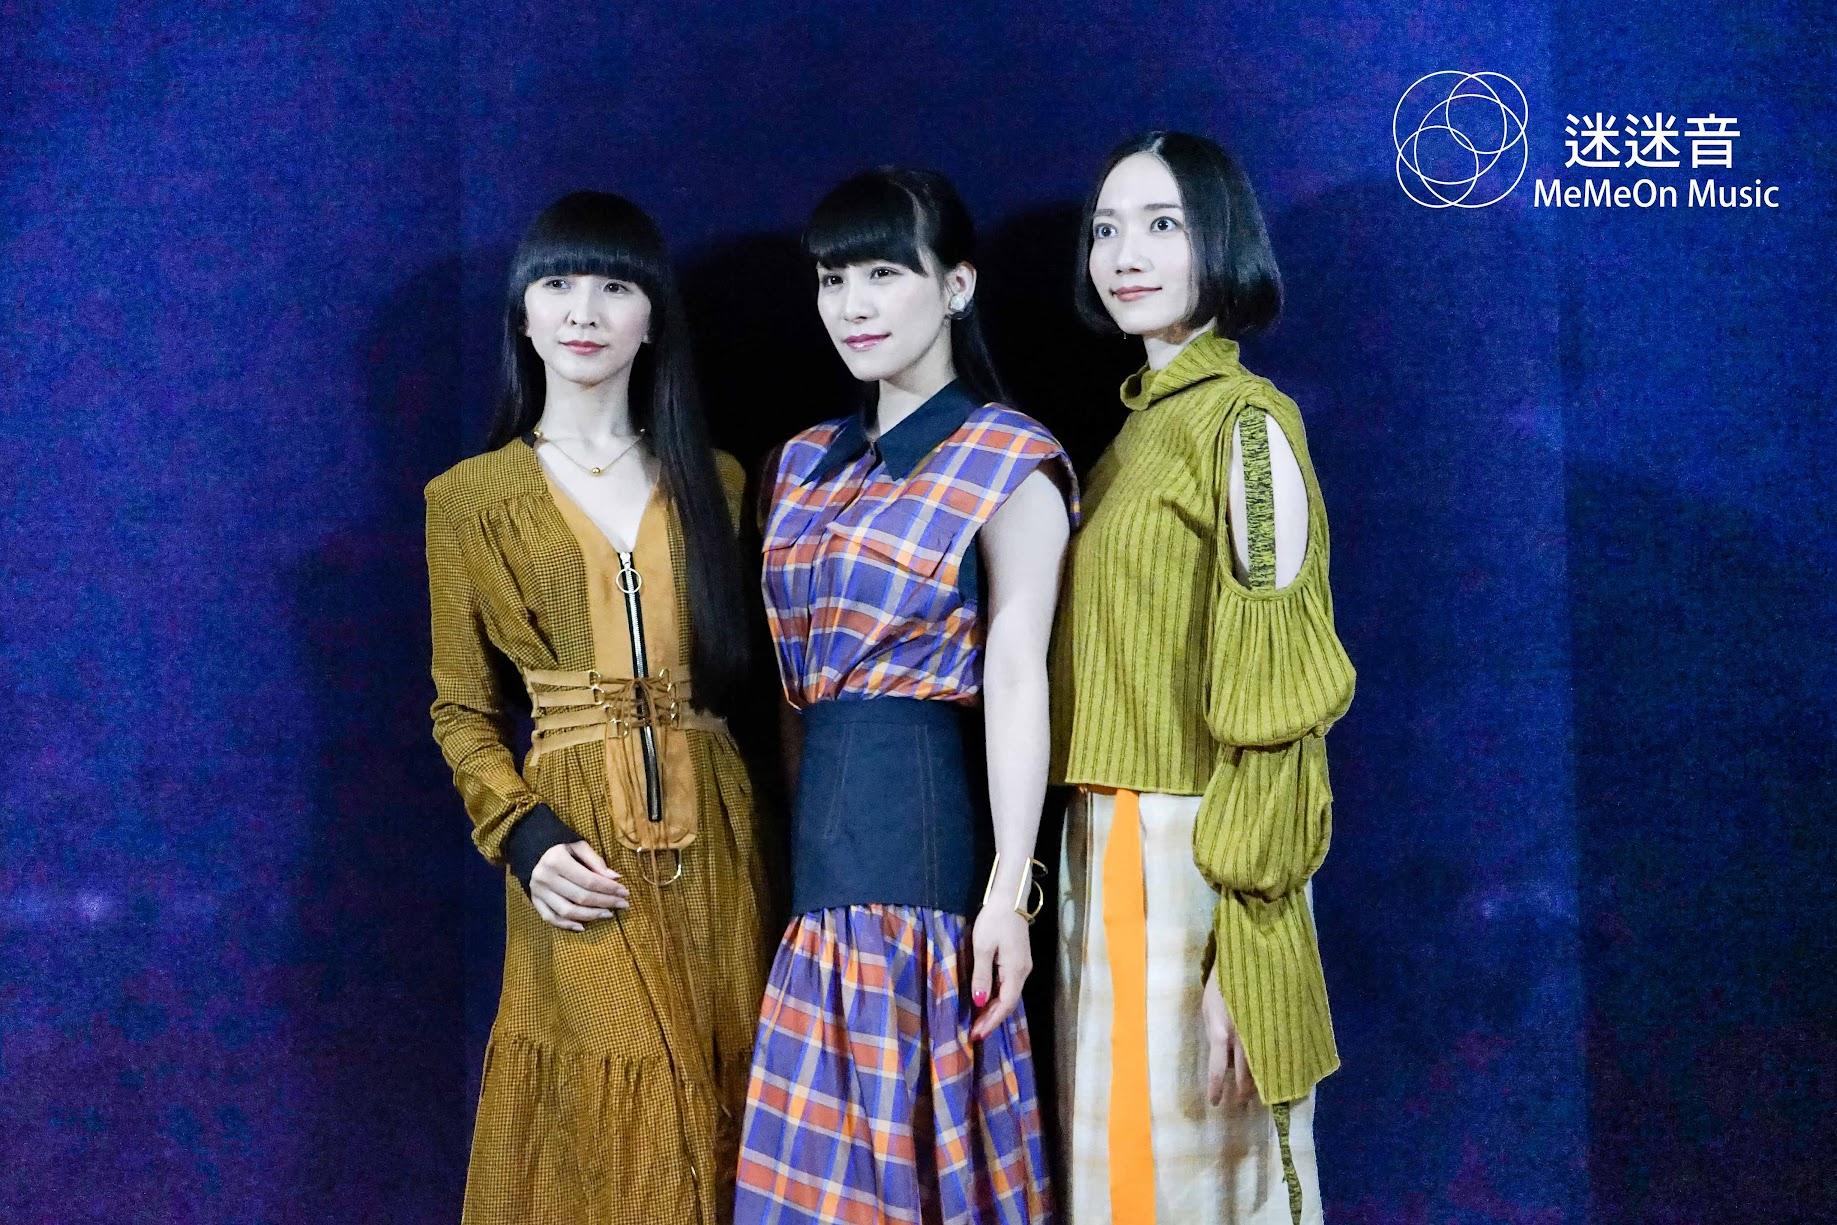 【MeMeOn インタビュー】Perfume台湾演出直前 「台湾の化粧品、オファー待ってます!」